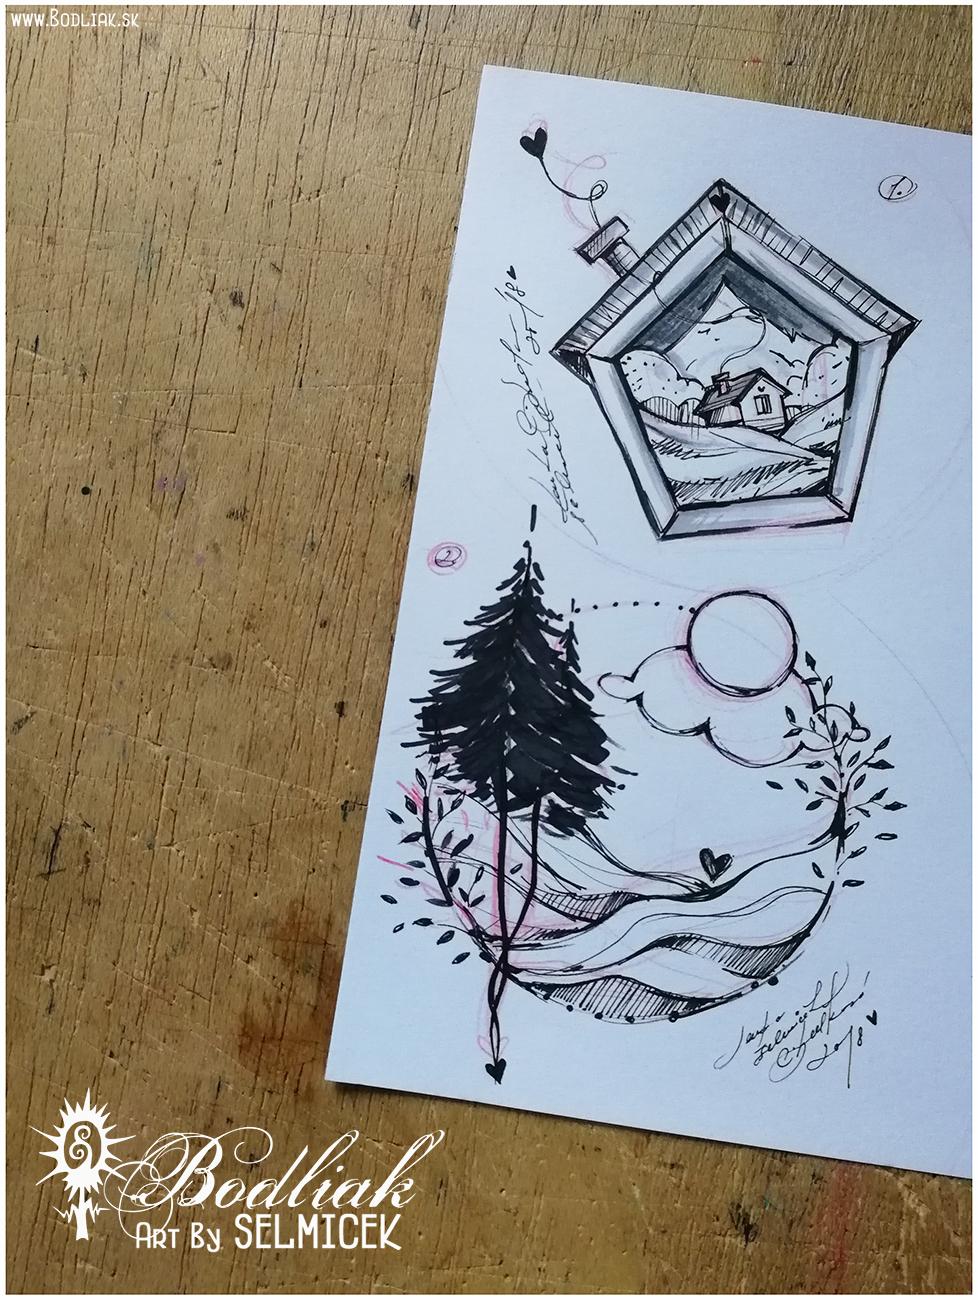 Domček v domčeku a môj kľud (krajina v kruhu)   autor: Selmicek   Domček v domčeku  - 8,5cm x 9cm ...  Krajina v kruhu - môj kľud  - 11,5cm x 10cm